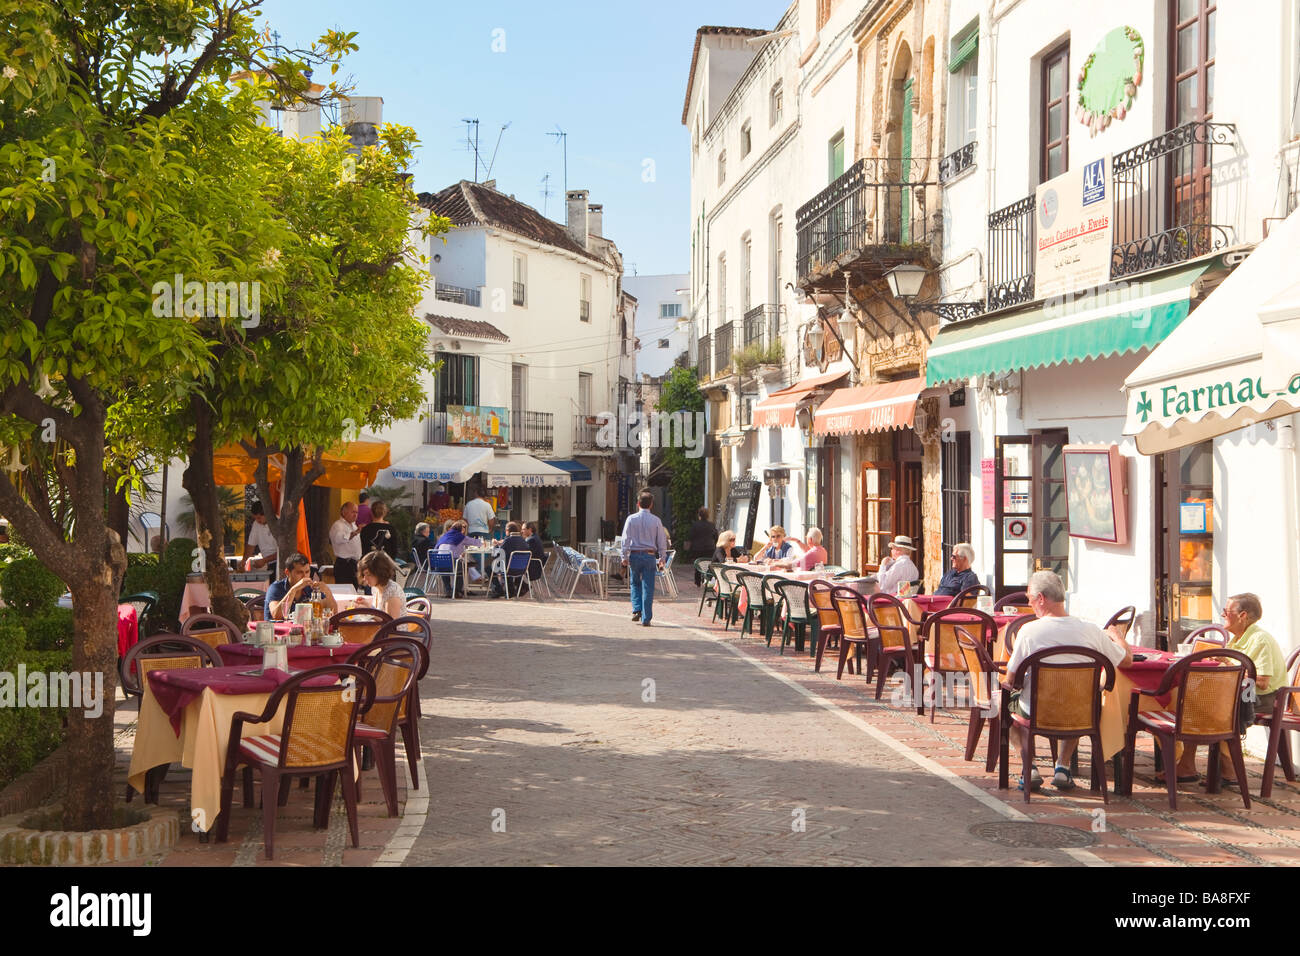 Marbella Malaga Province Costa del Sol Spain Plaza de los Naranjos Orange Square Cafes and restaurants - Stock Image